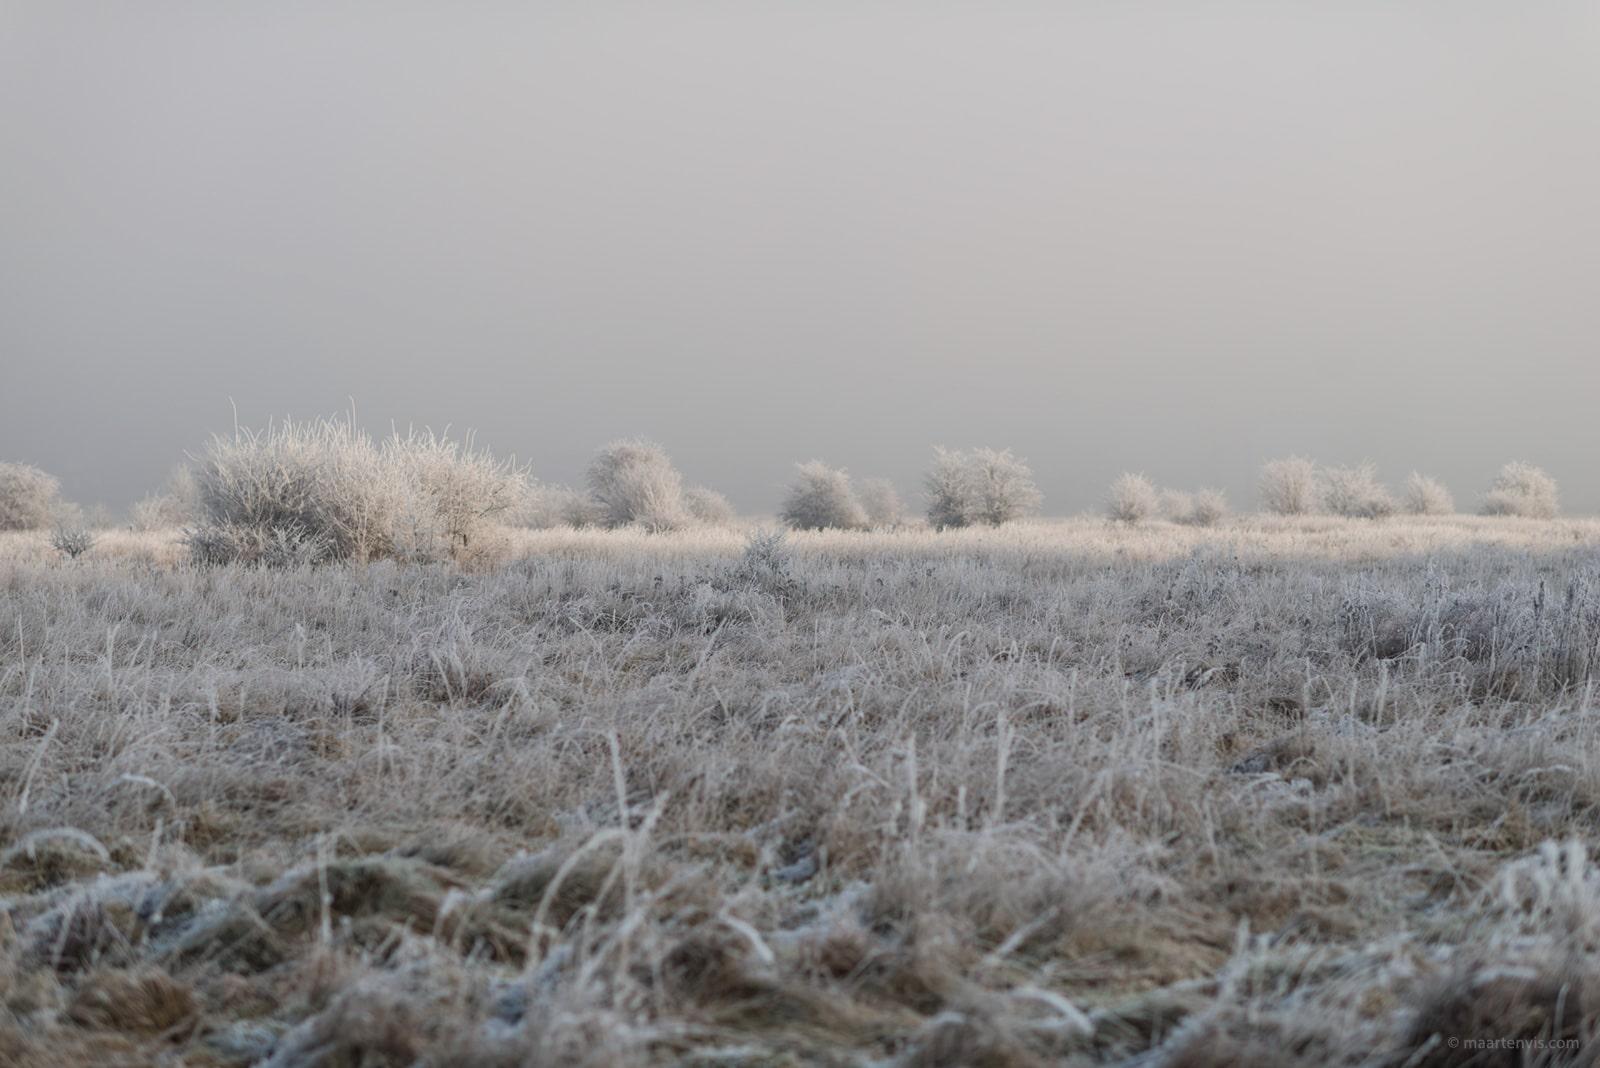 20161231 7279 - Winter in Limburg